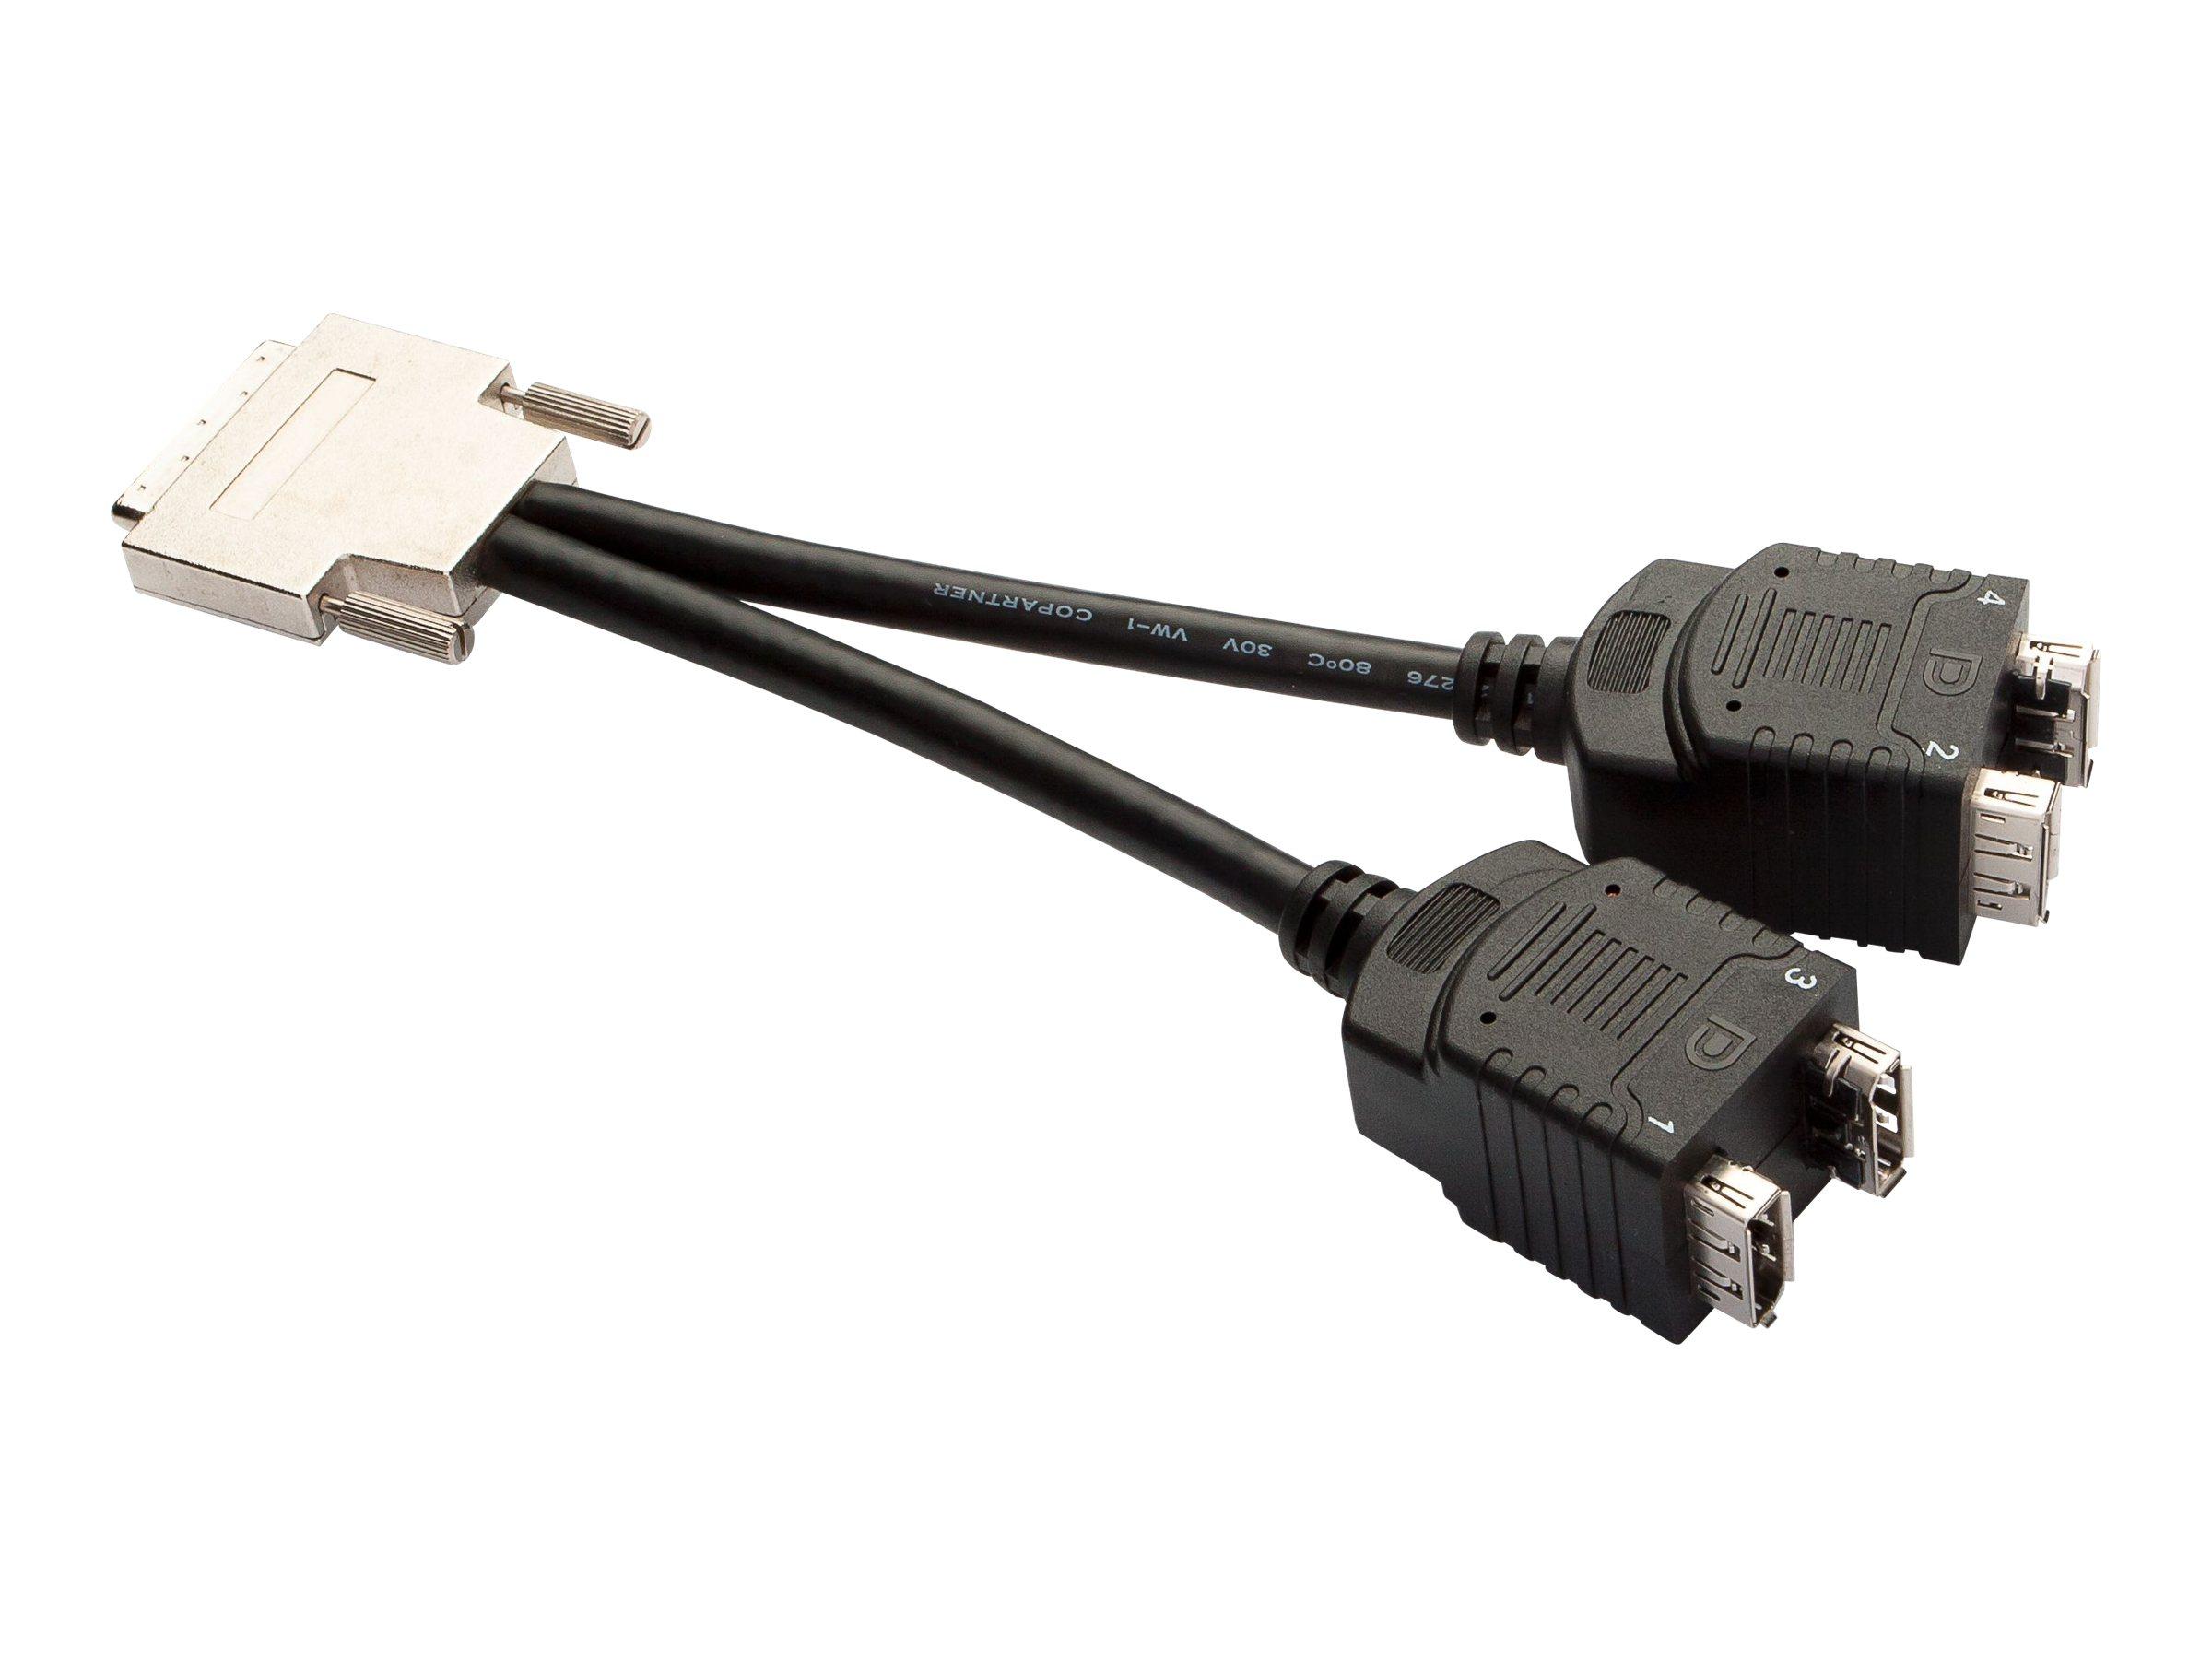 PNY - DisplayPort-Kabel - DisplayPort (W) bis VHDCI 68-polig (M)